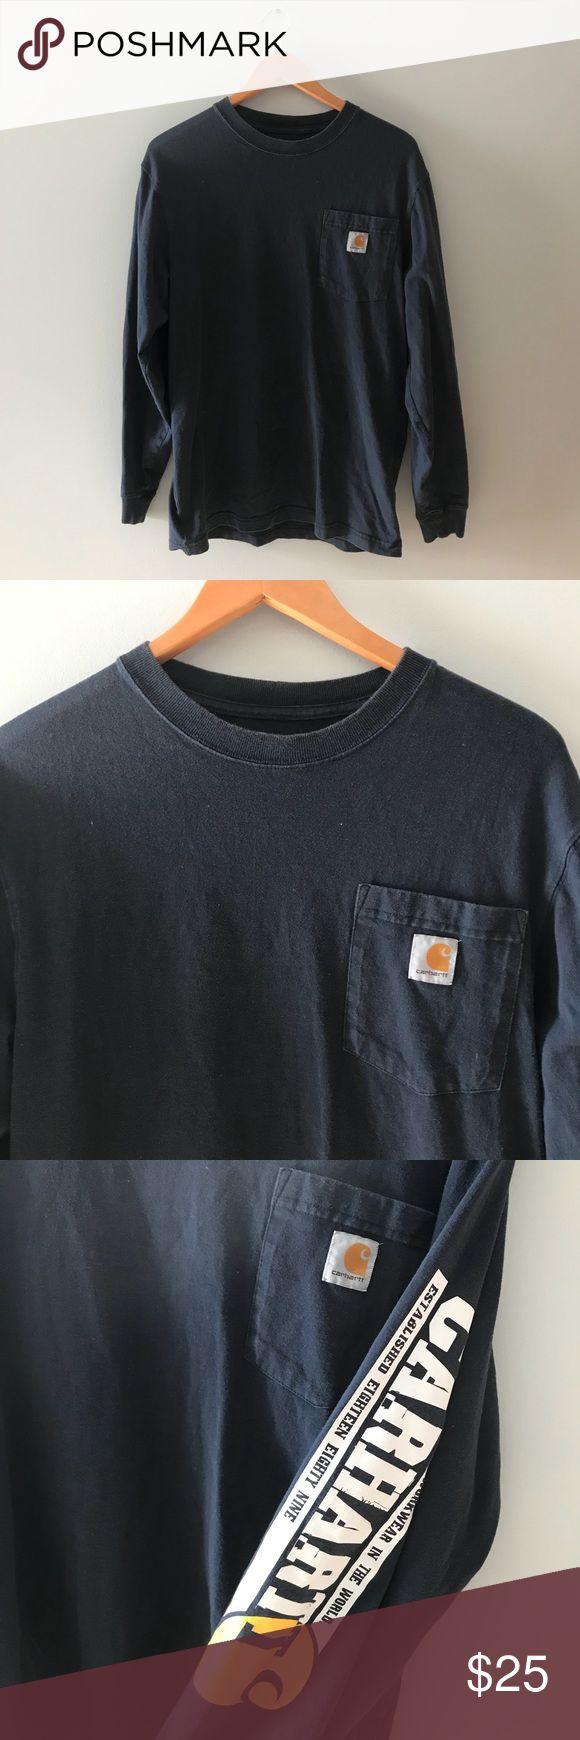 "Carhartt Long Sleeve Spell Out T Shirt Carhartt Spell Out T Shirt with pocket, the logo featured on the pocket, and the name ""carhartt"" on sleeve.   Chest: 18"" Length: 27""  Small / medium Carhartt Shirts Tees - Long Sleeve"